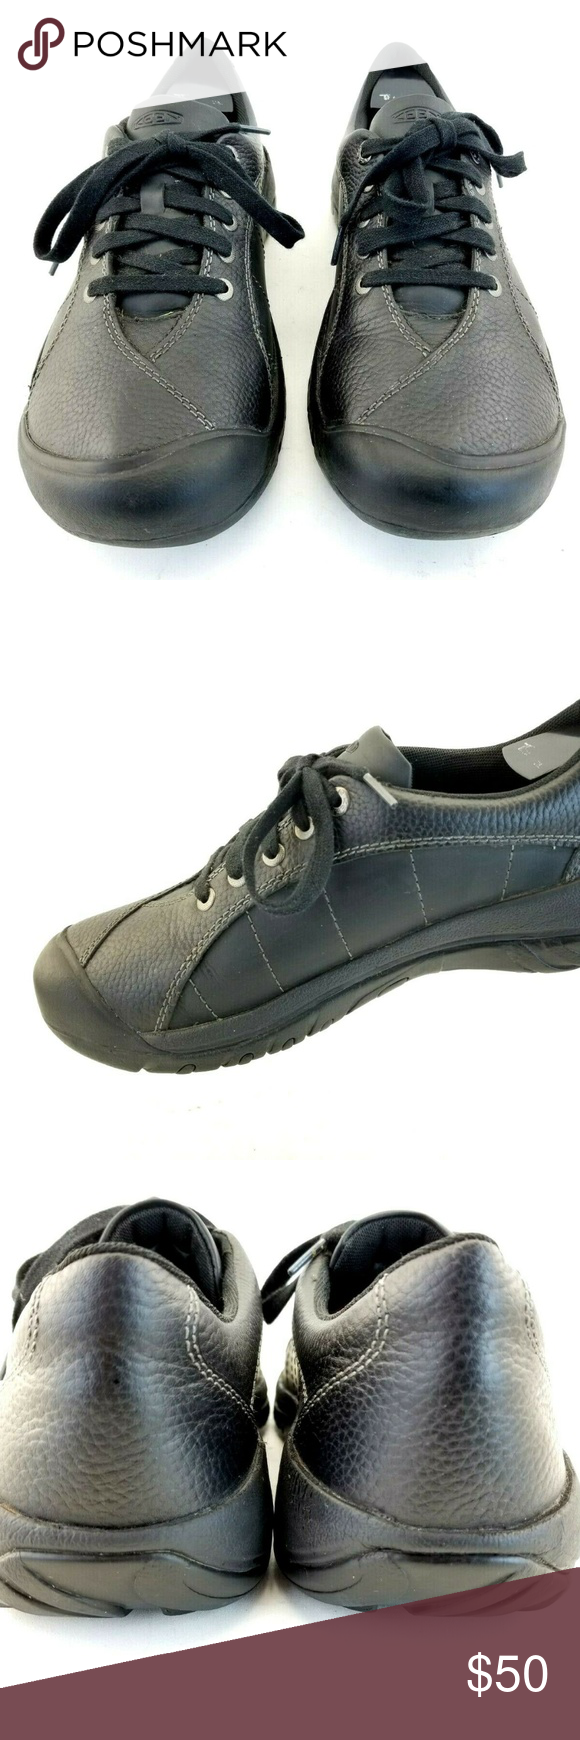 KEEN Womans 'Presidio' Black Leather Oxford Hikin KEEN